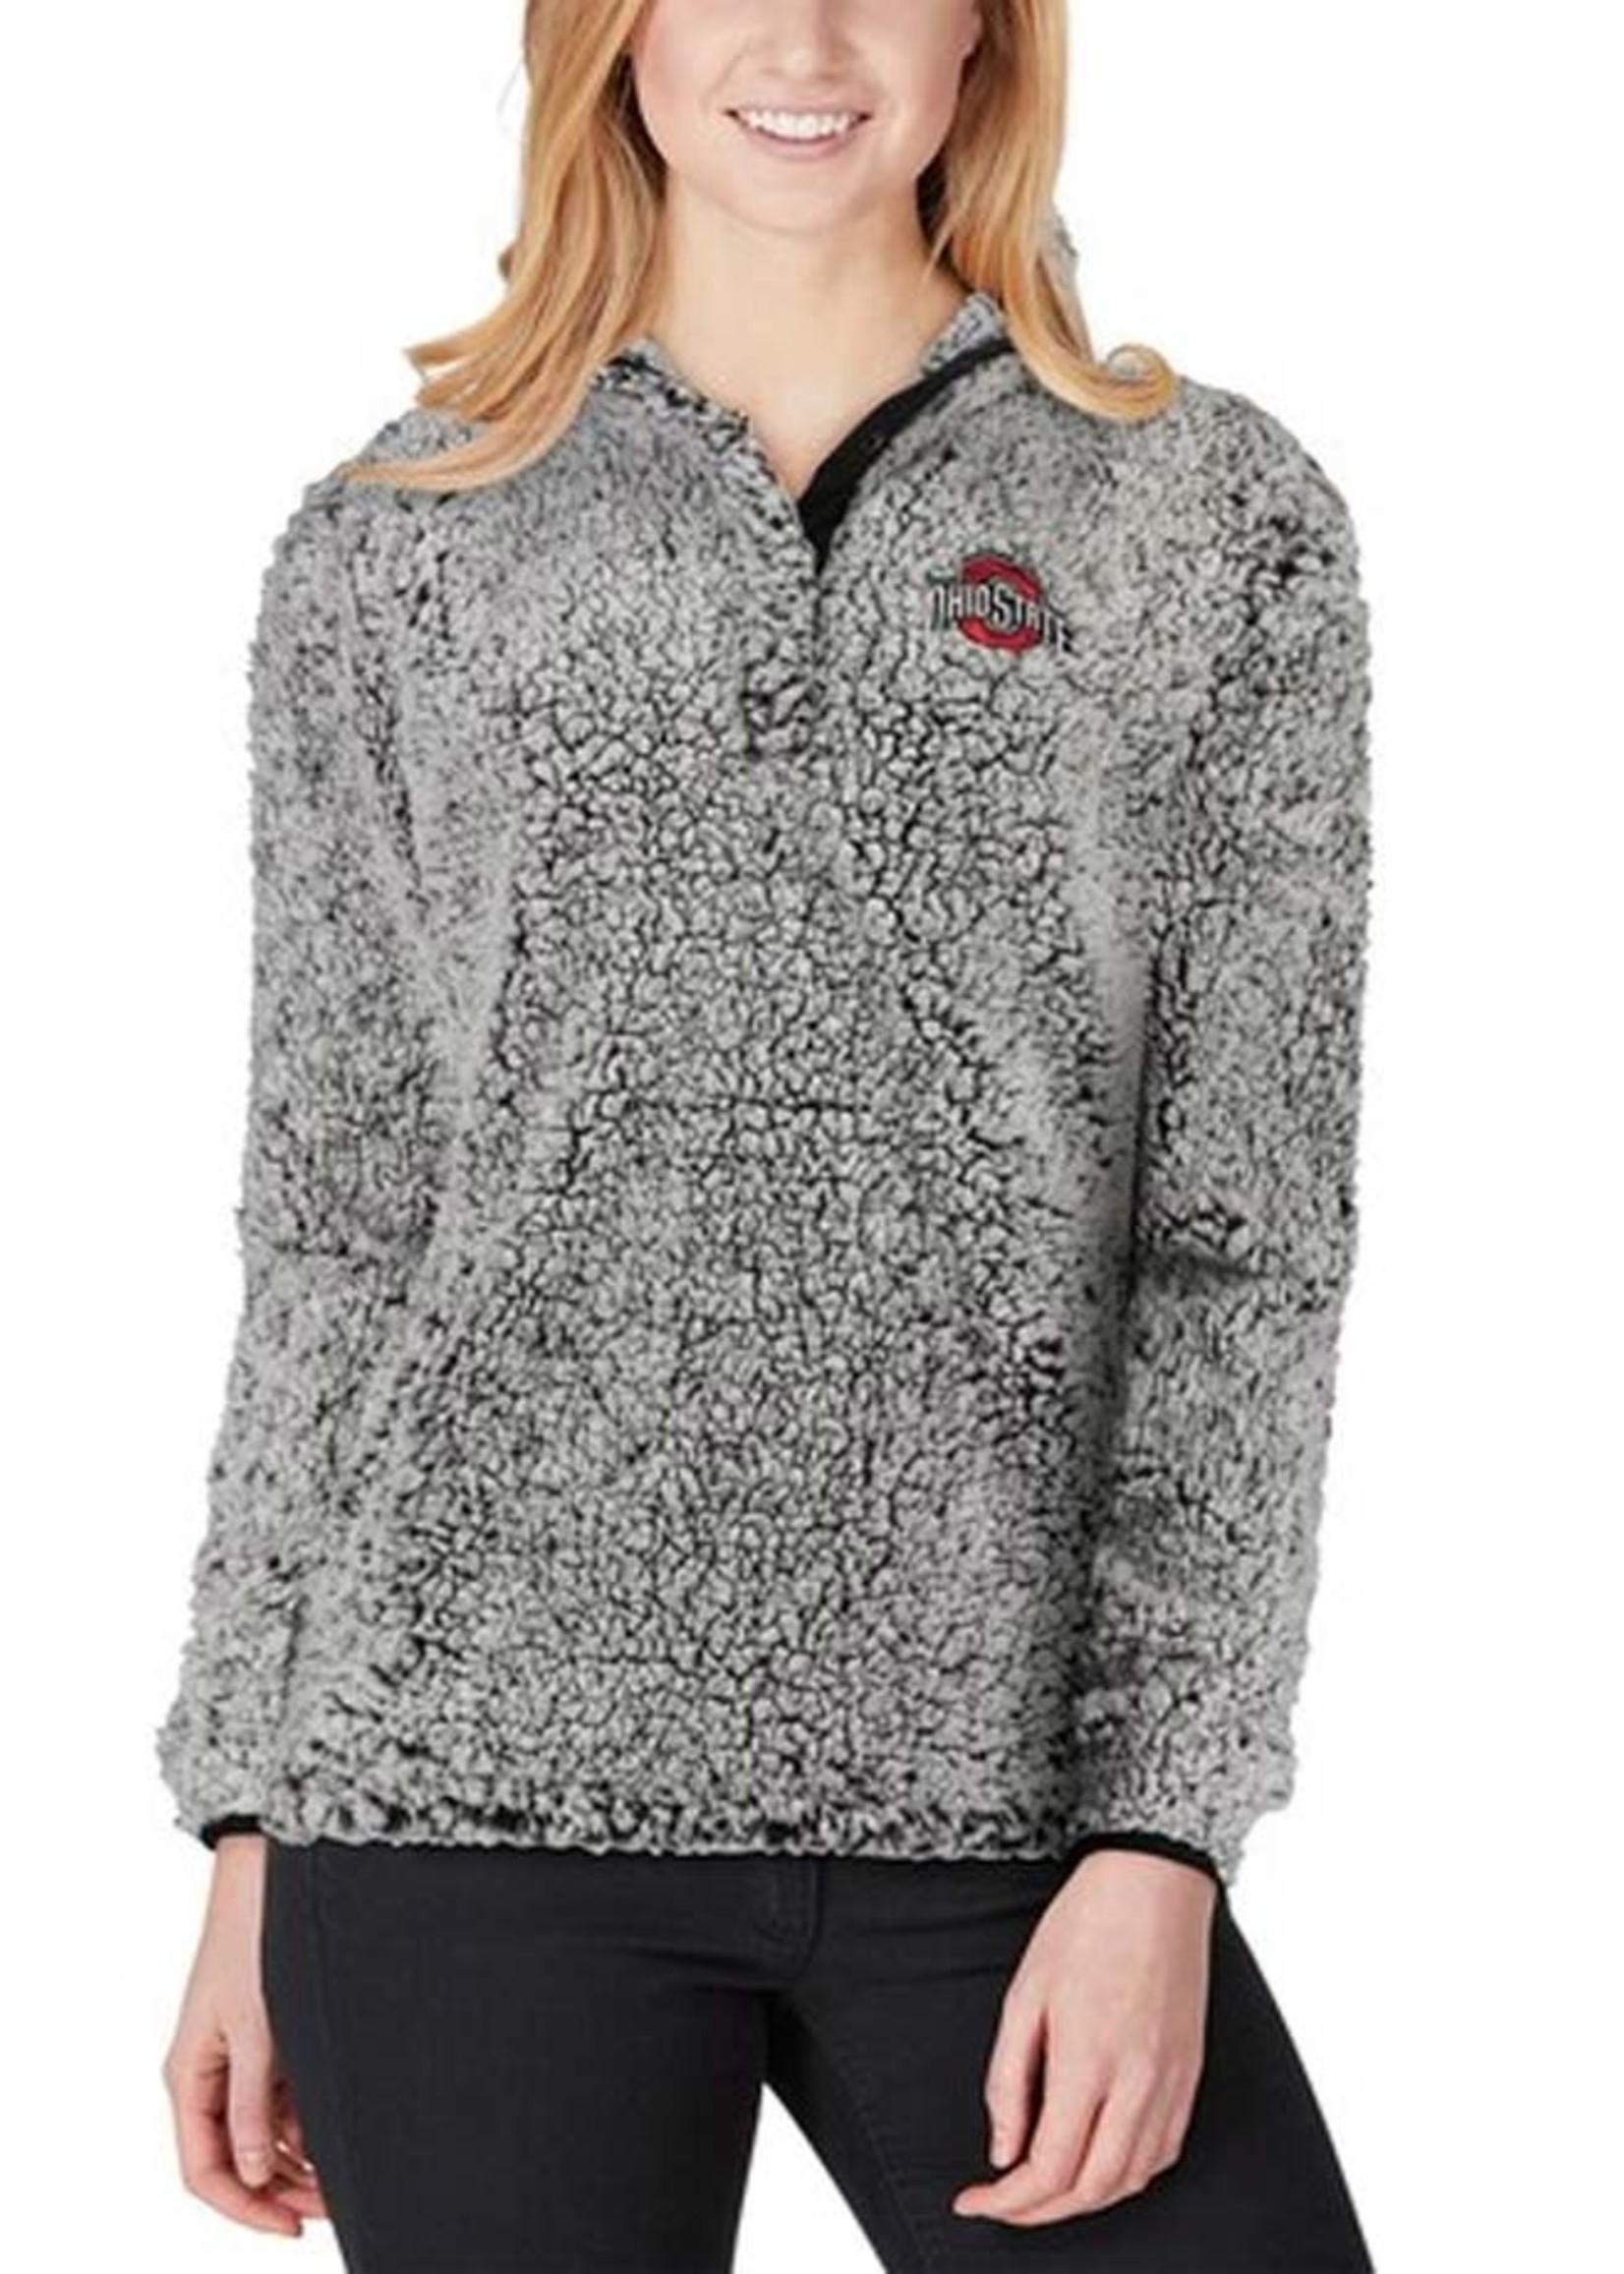 Ohio State Buckeyes Women's Sherpa Quarter-Snap Pullover Jacket